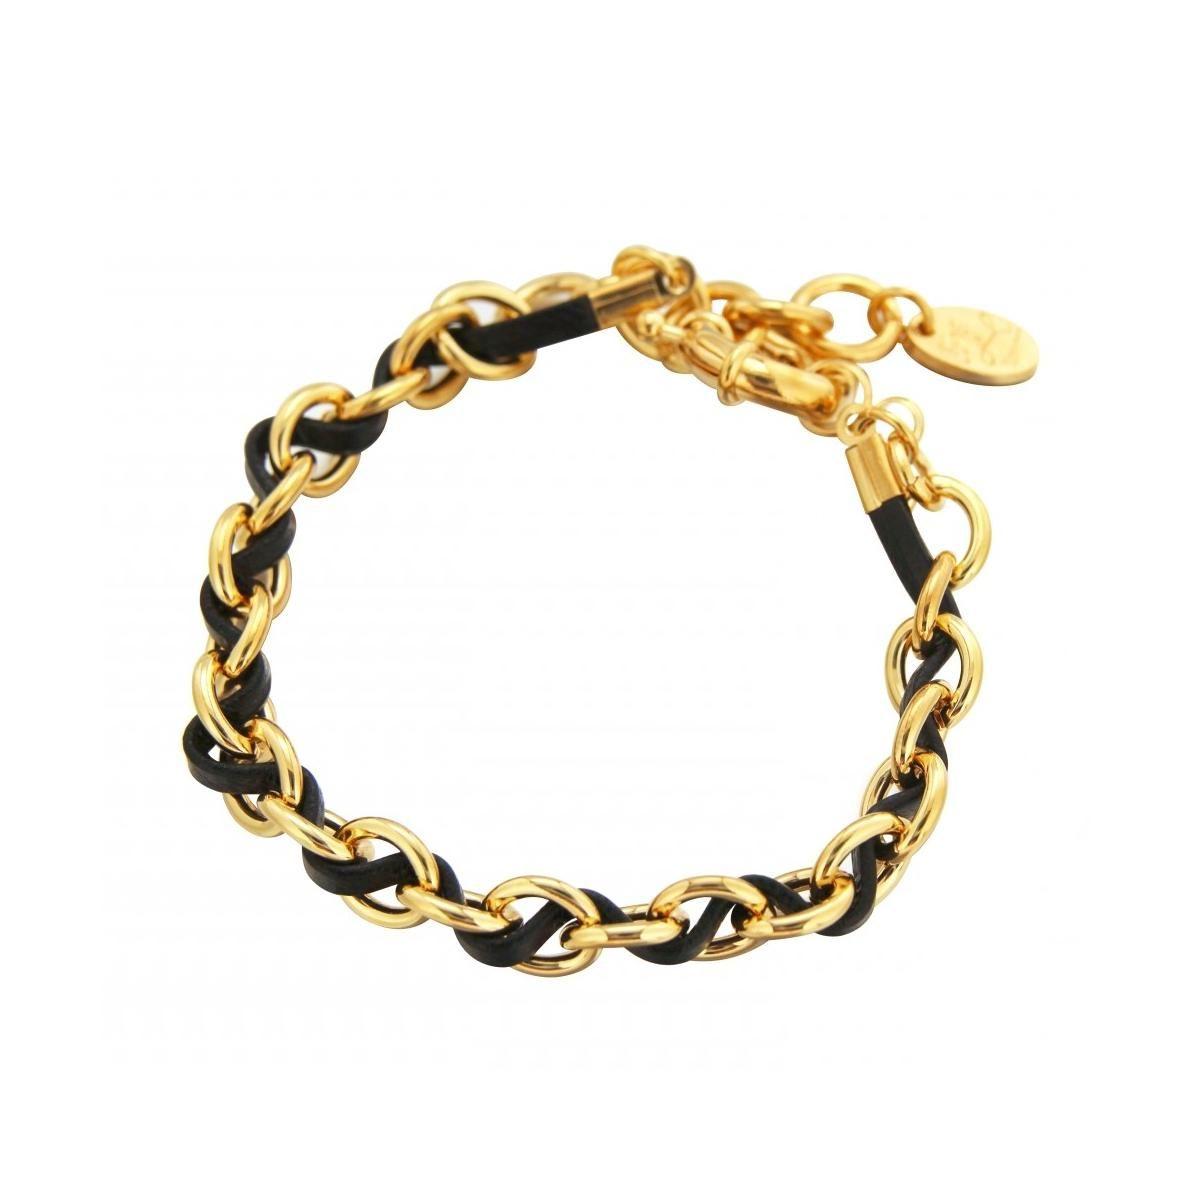 bracelet gourmette tendance pour femme en plaqu or et. Black Bedroom Furniture Sets. Home Design Ideas